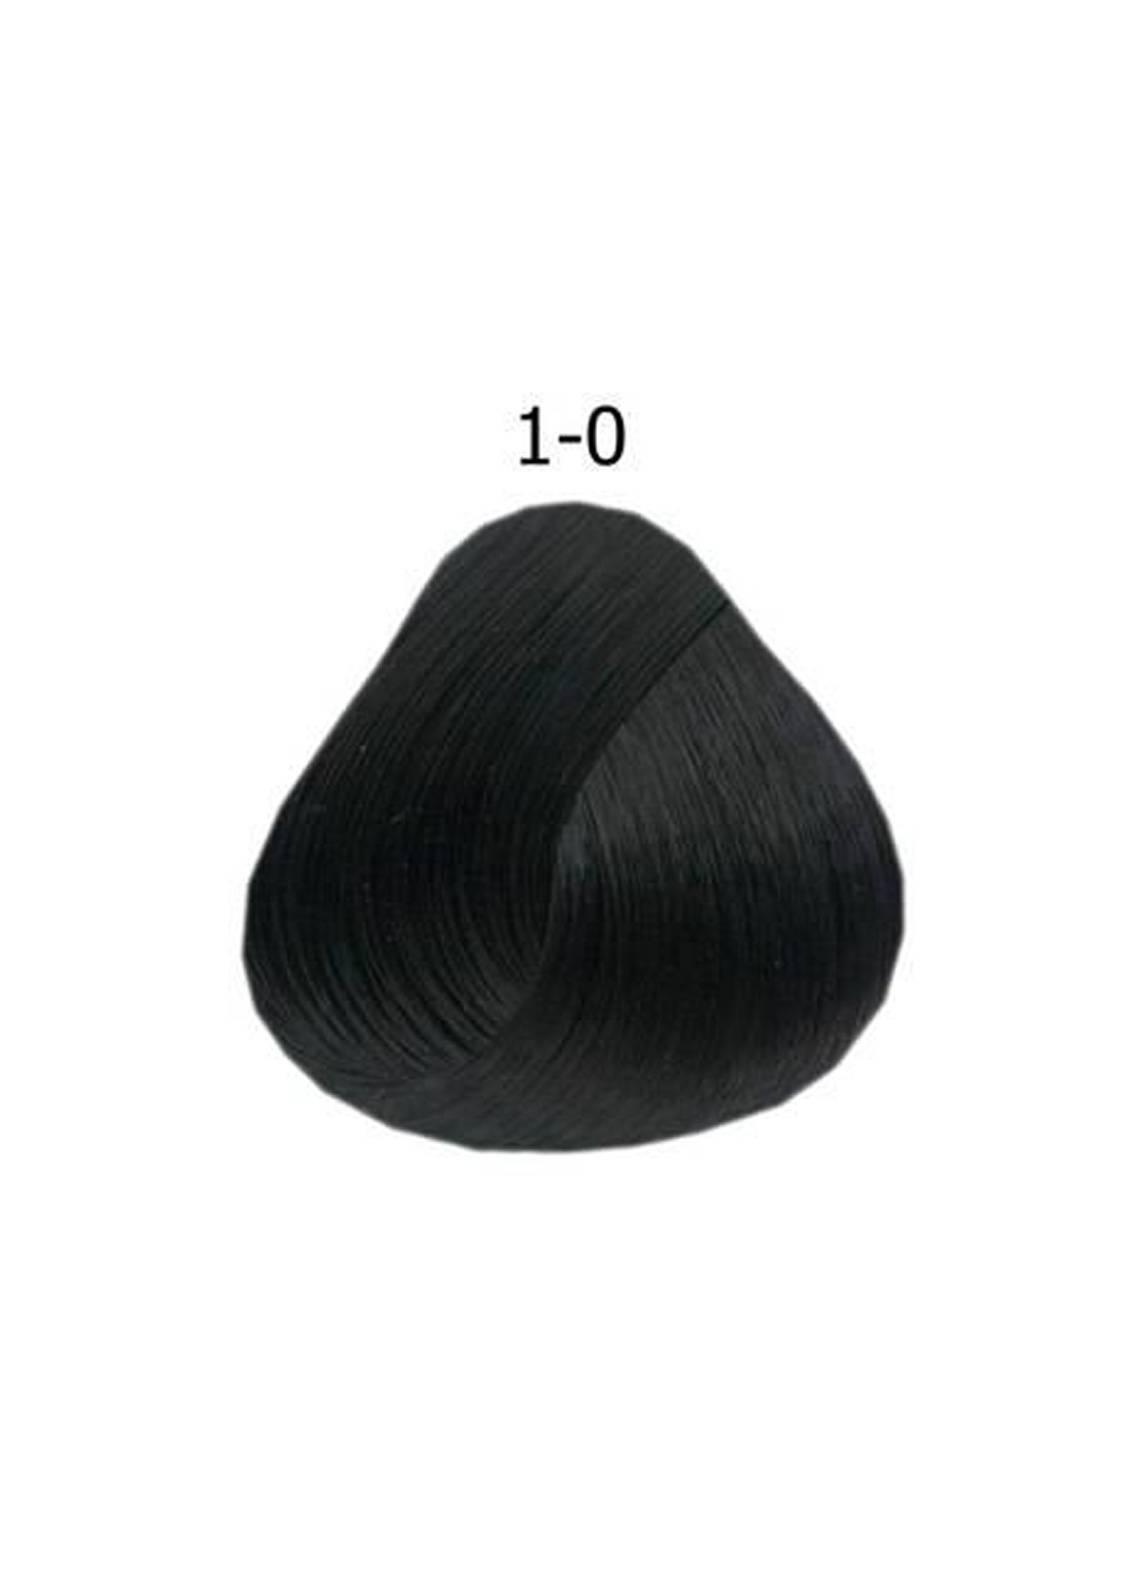 Schwarzkopf Igora Royal Natural Hair Color - Black 1-0